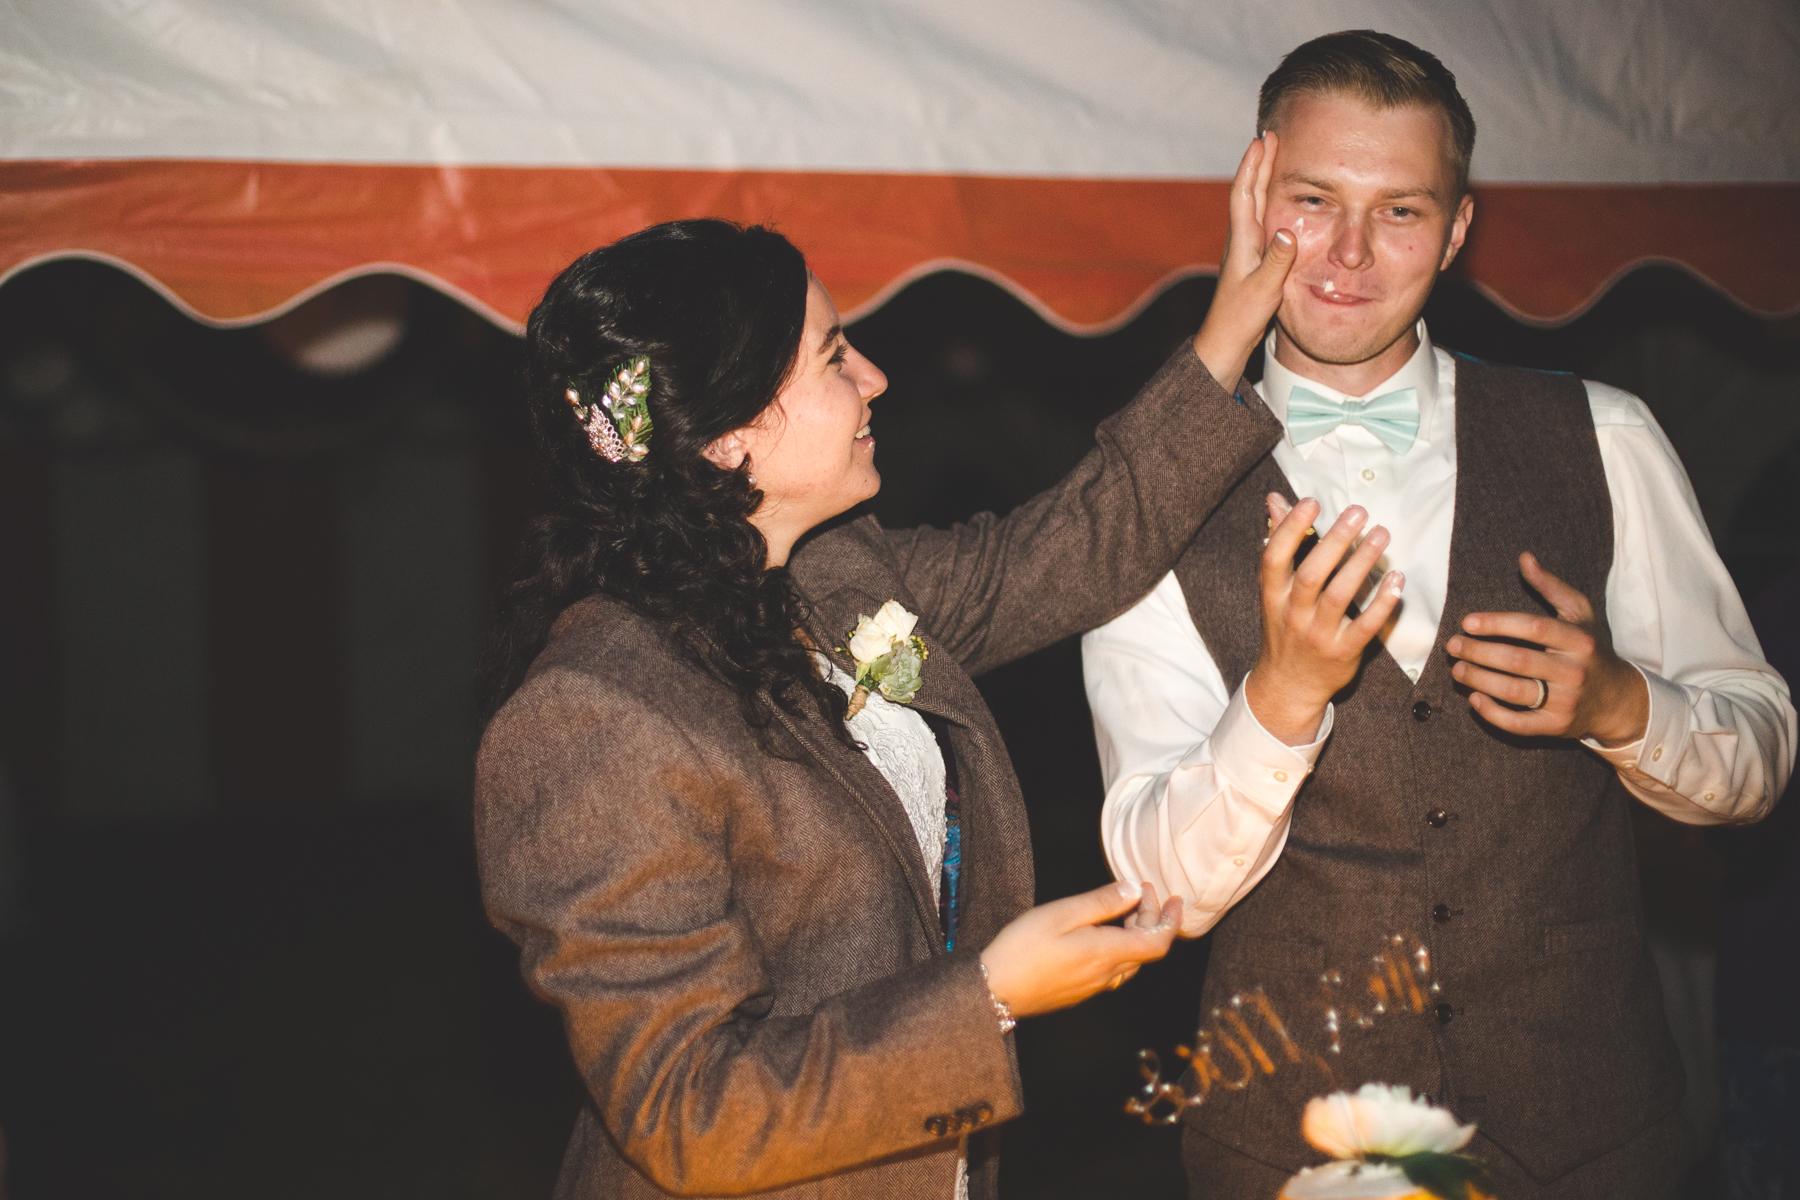 20150808-oglovewedding3-91.jpg